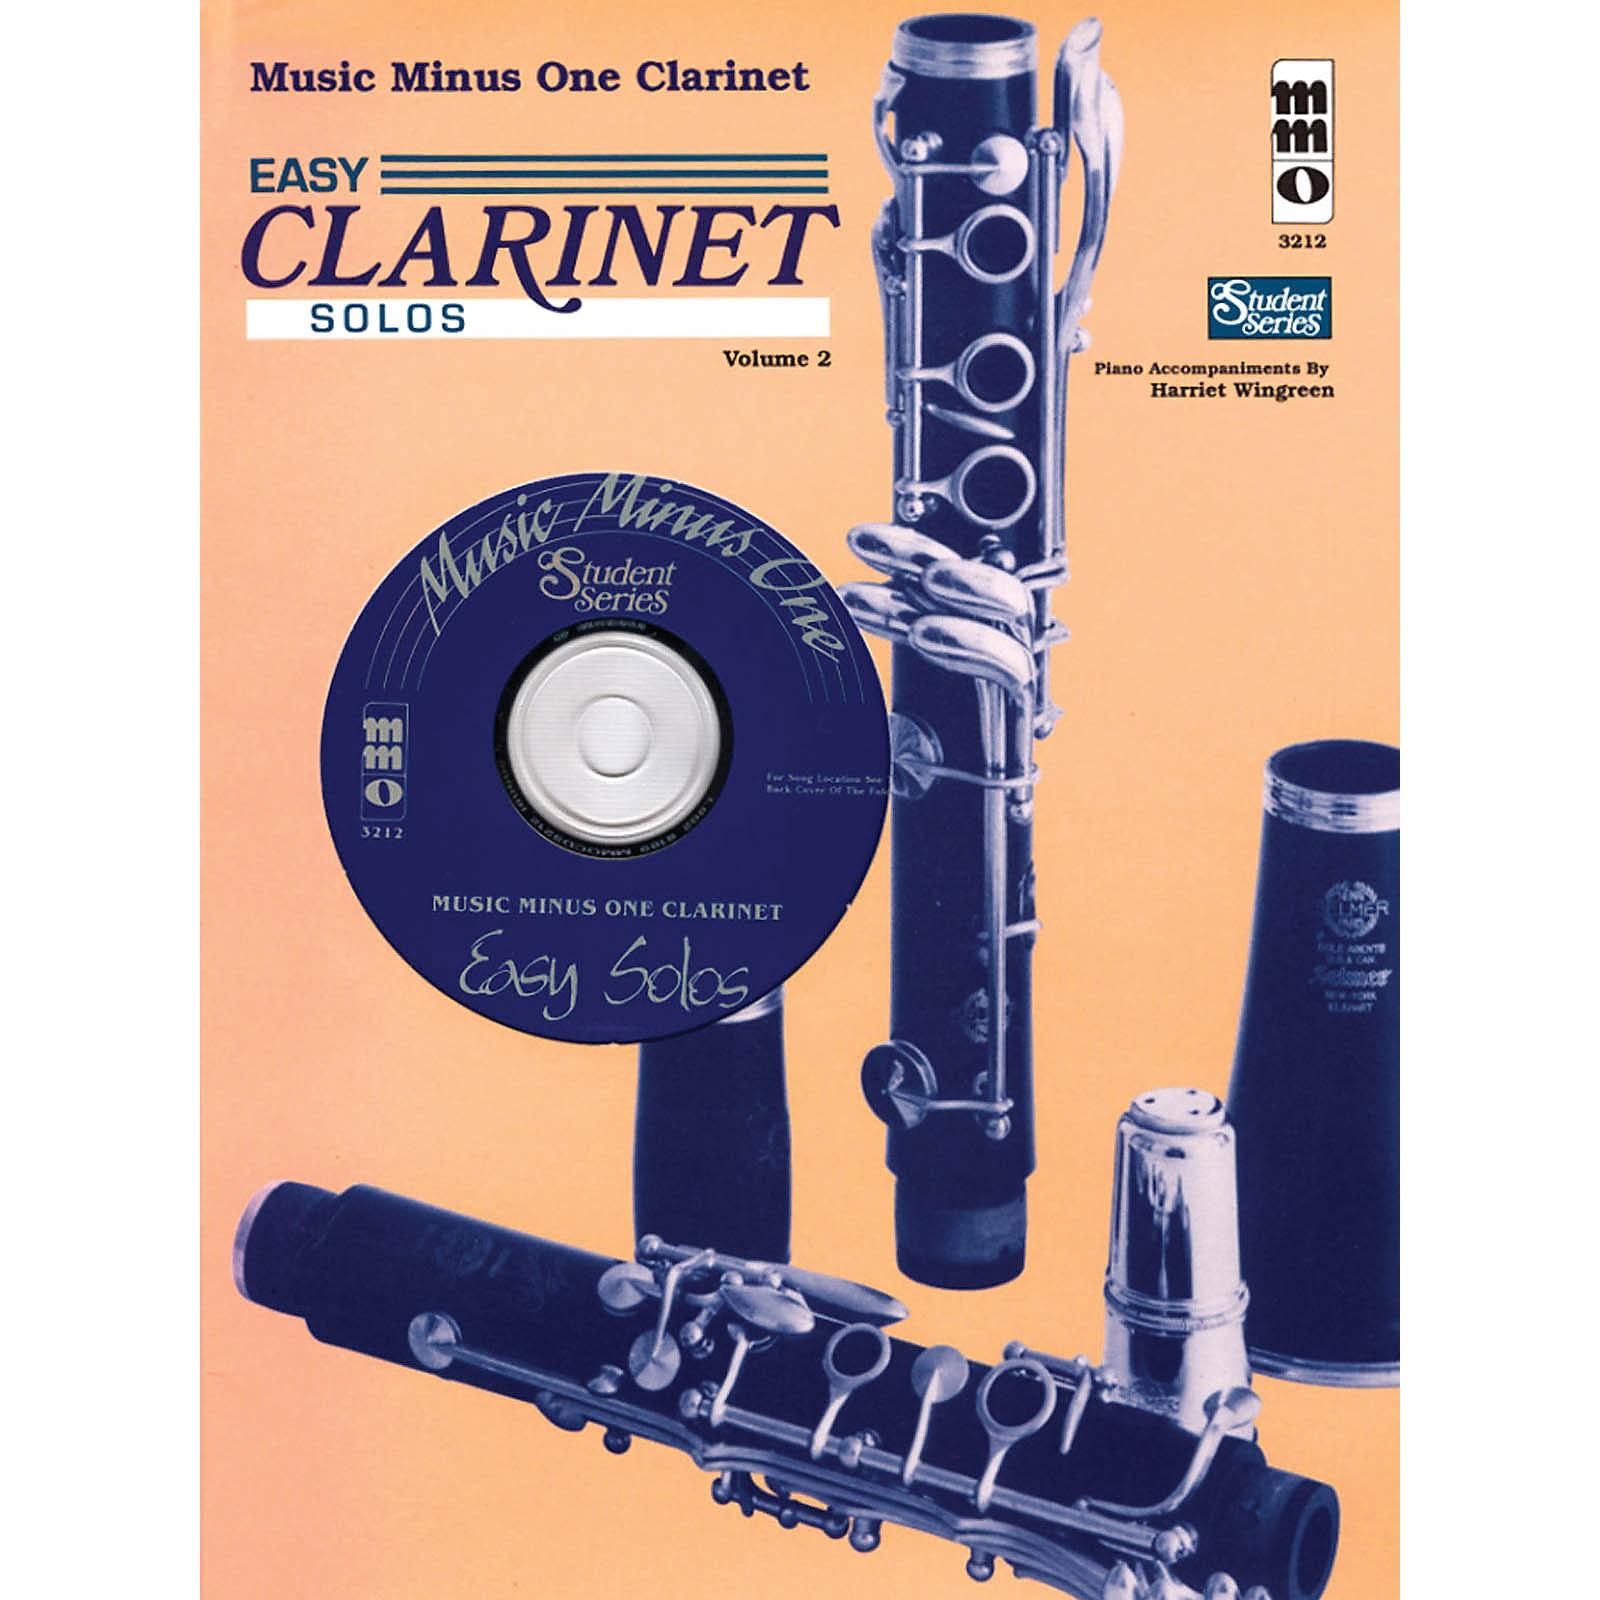 Music Minus One Easy Clarinet Solos, Vol. II - Student Level Music Minus One Series BK/CD